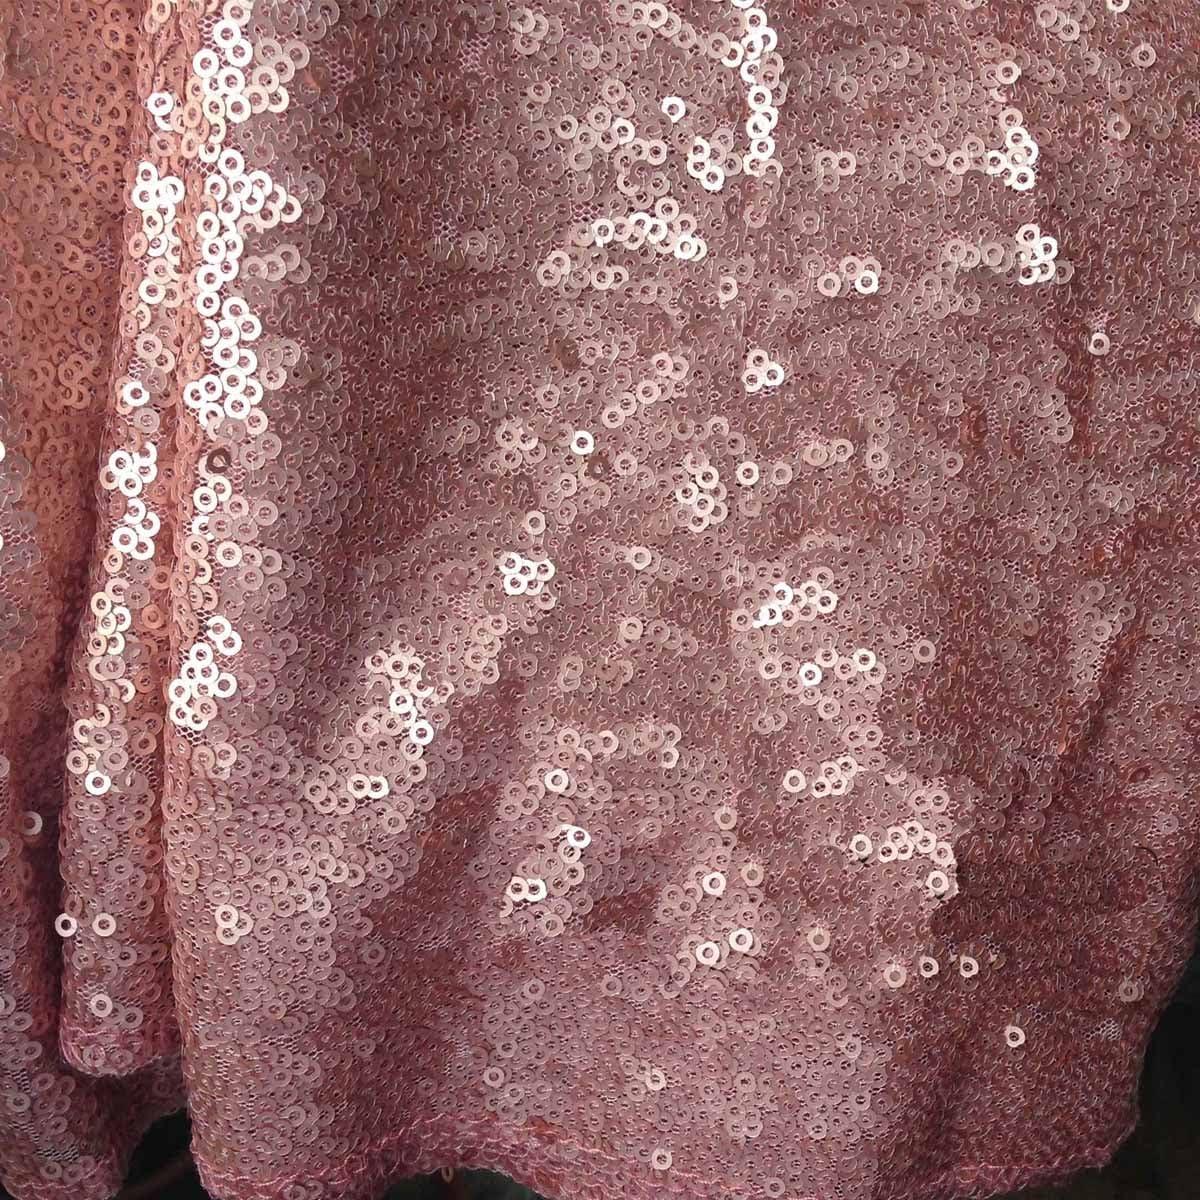 Lentejuelas tela rosa para coser disfraces Tejido de Encaje ...